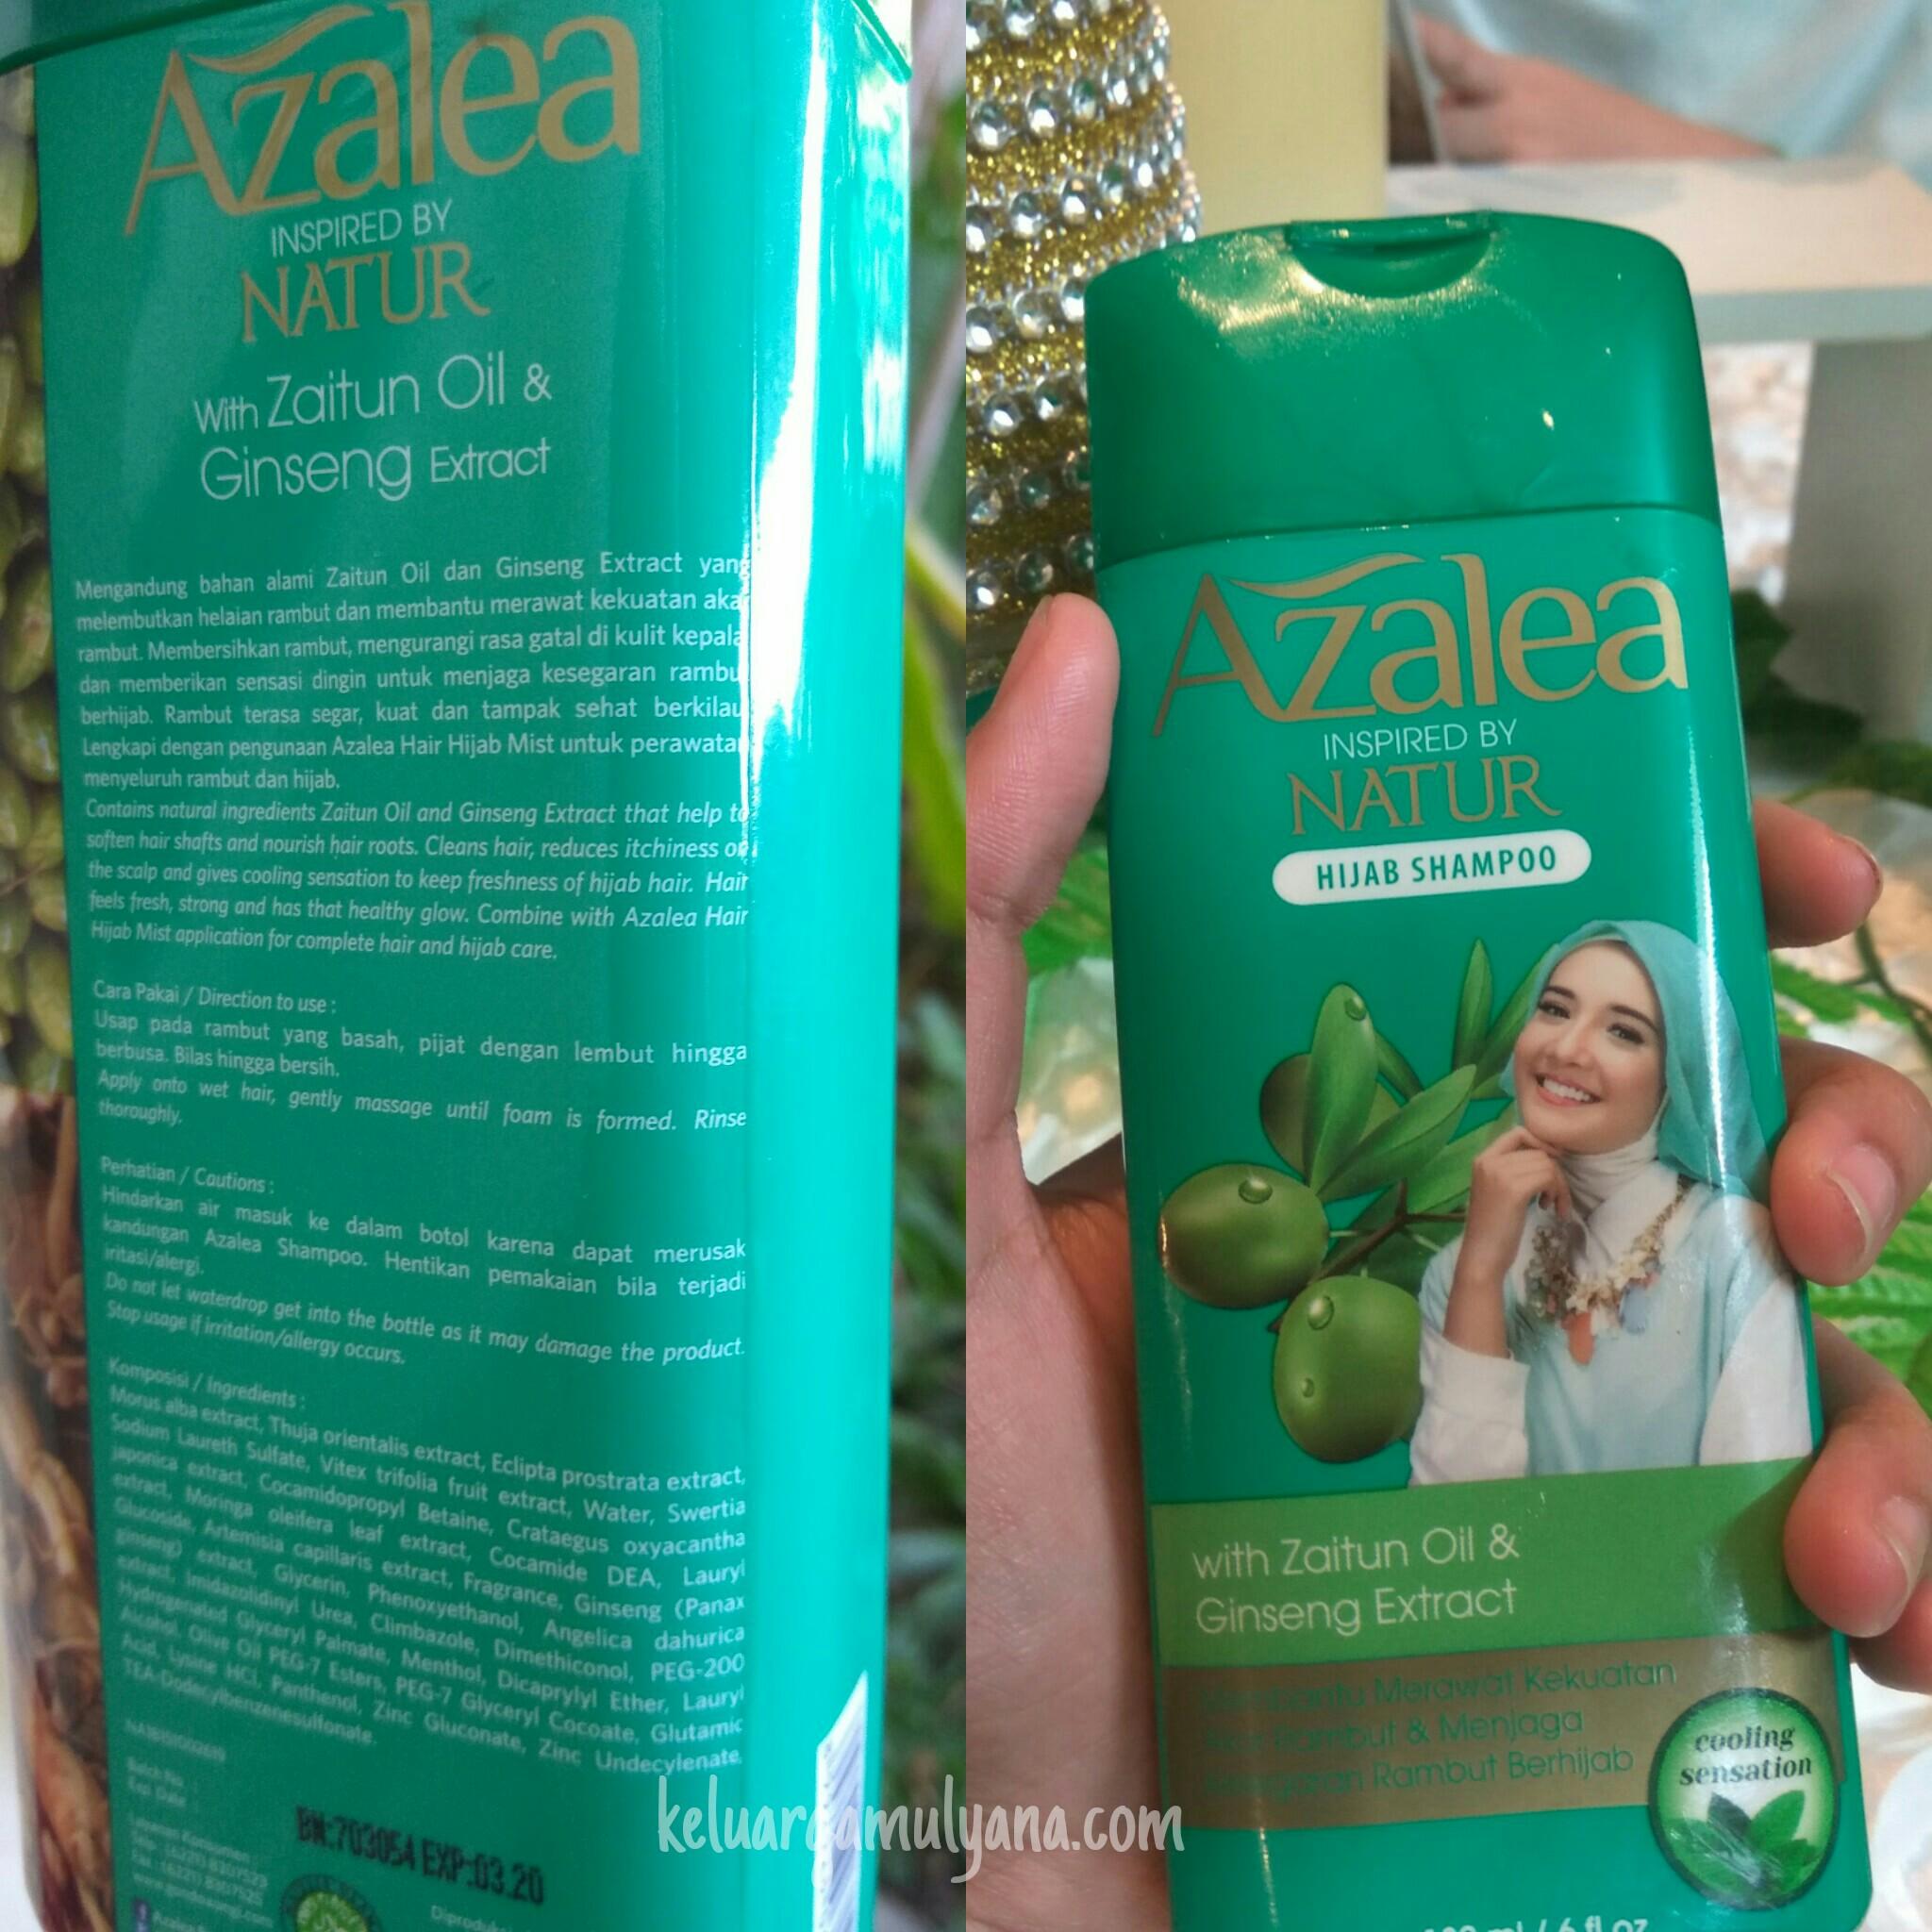 Azalea Hijab Shampoo kandungan